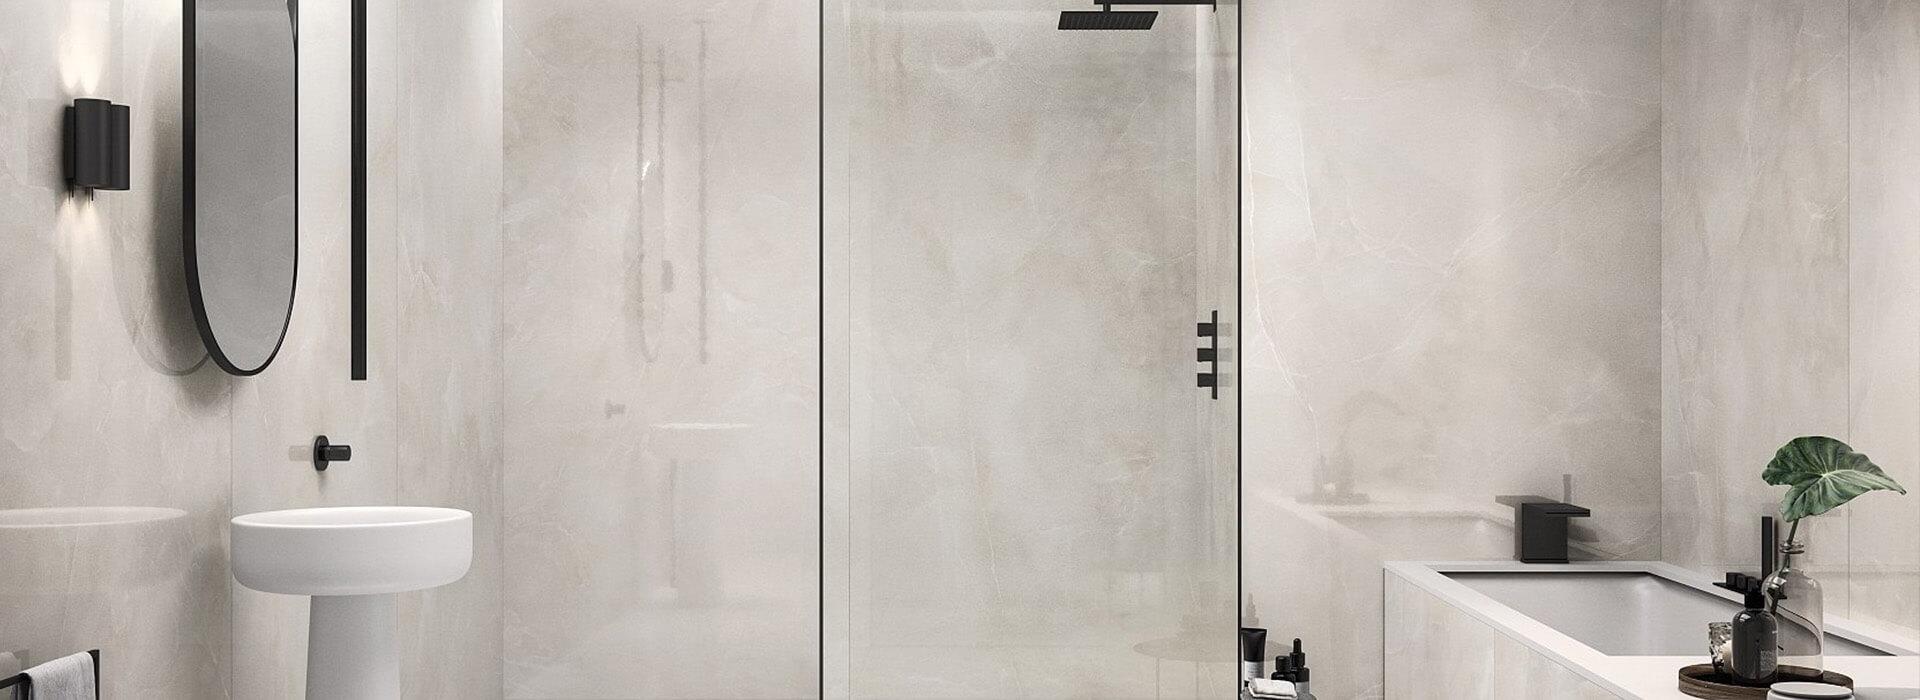 carrelage grand format salle de bain